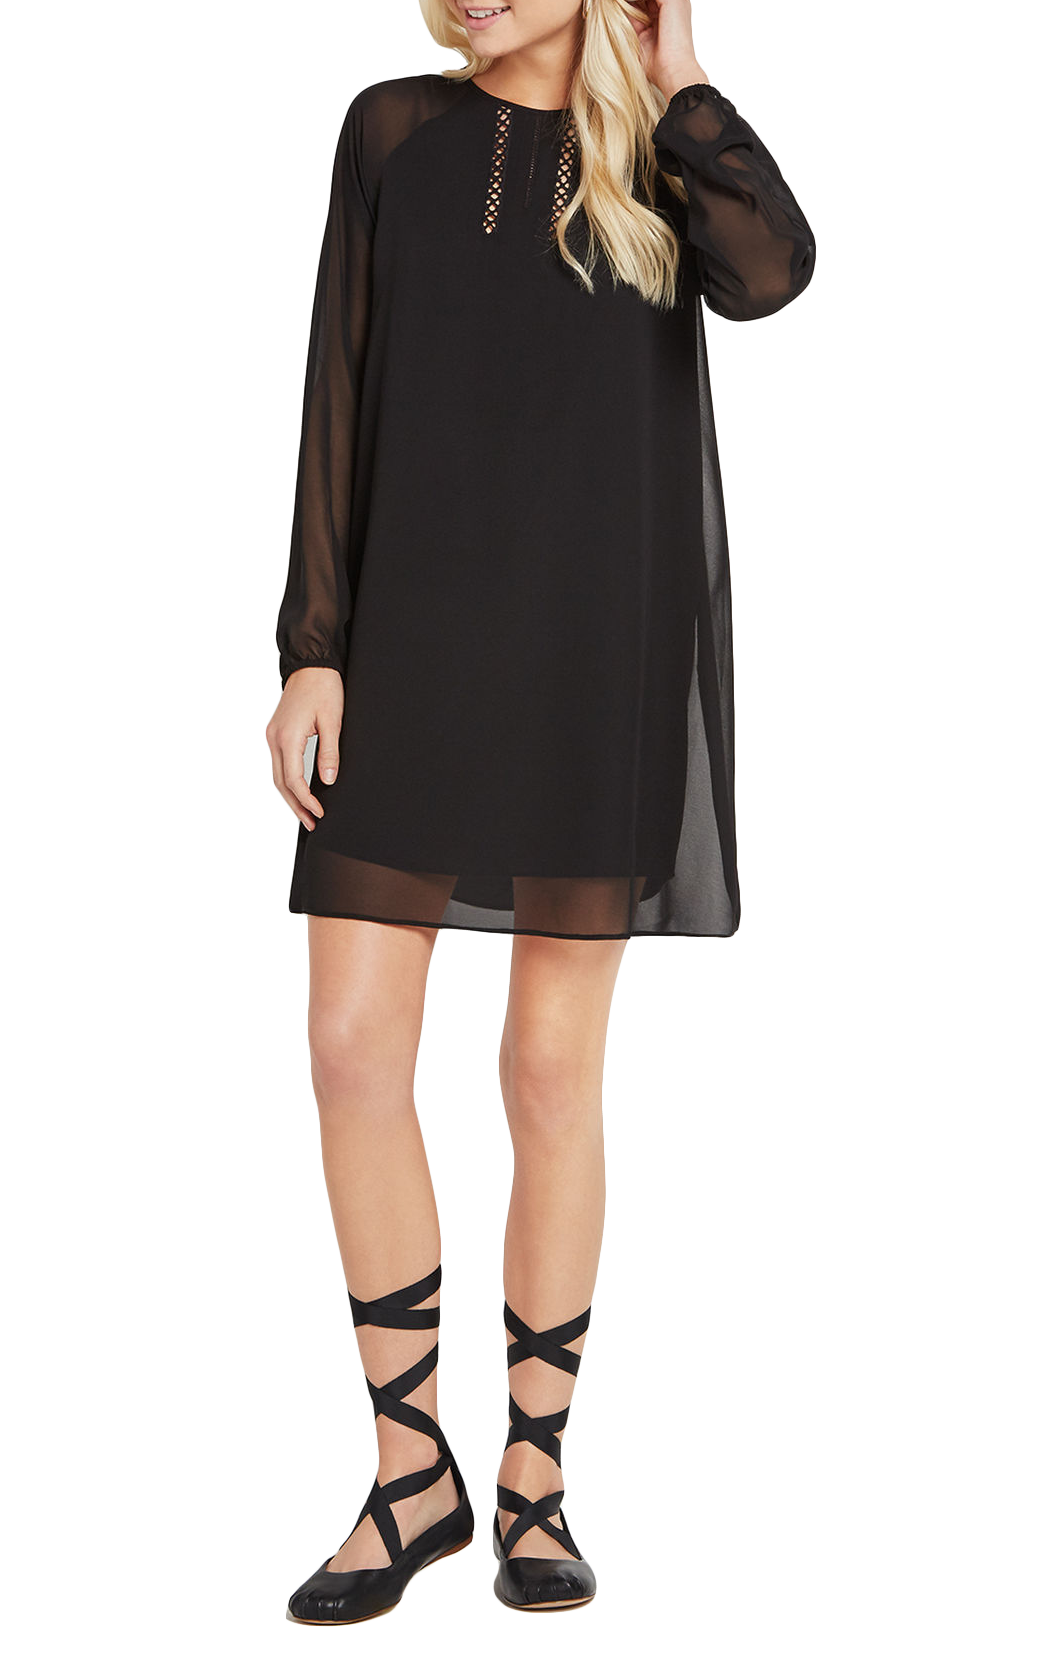 Lexi Dress Image